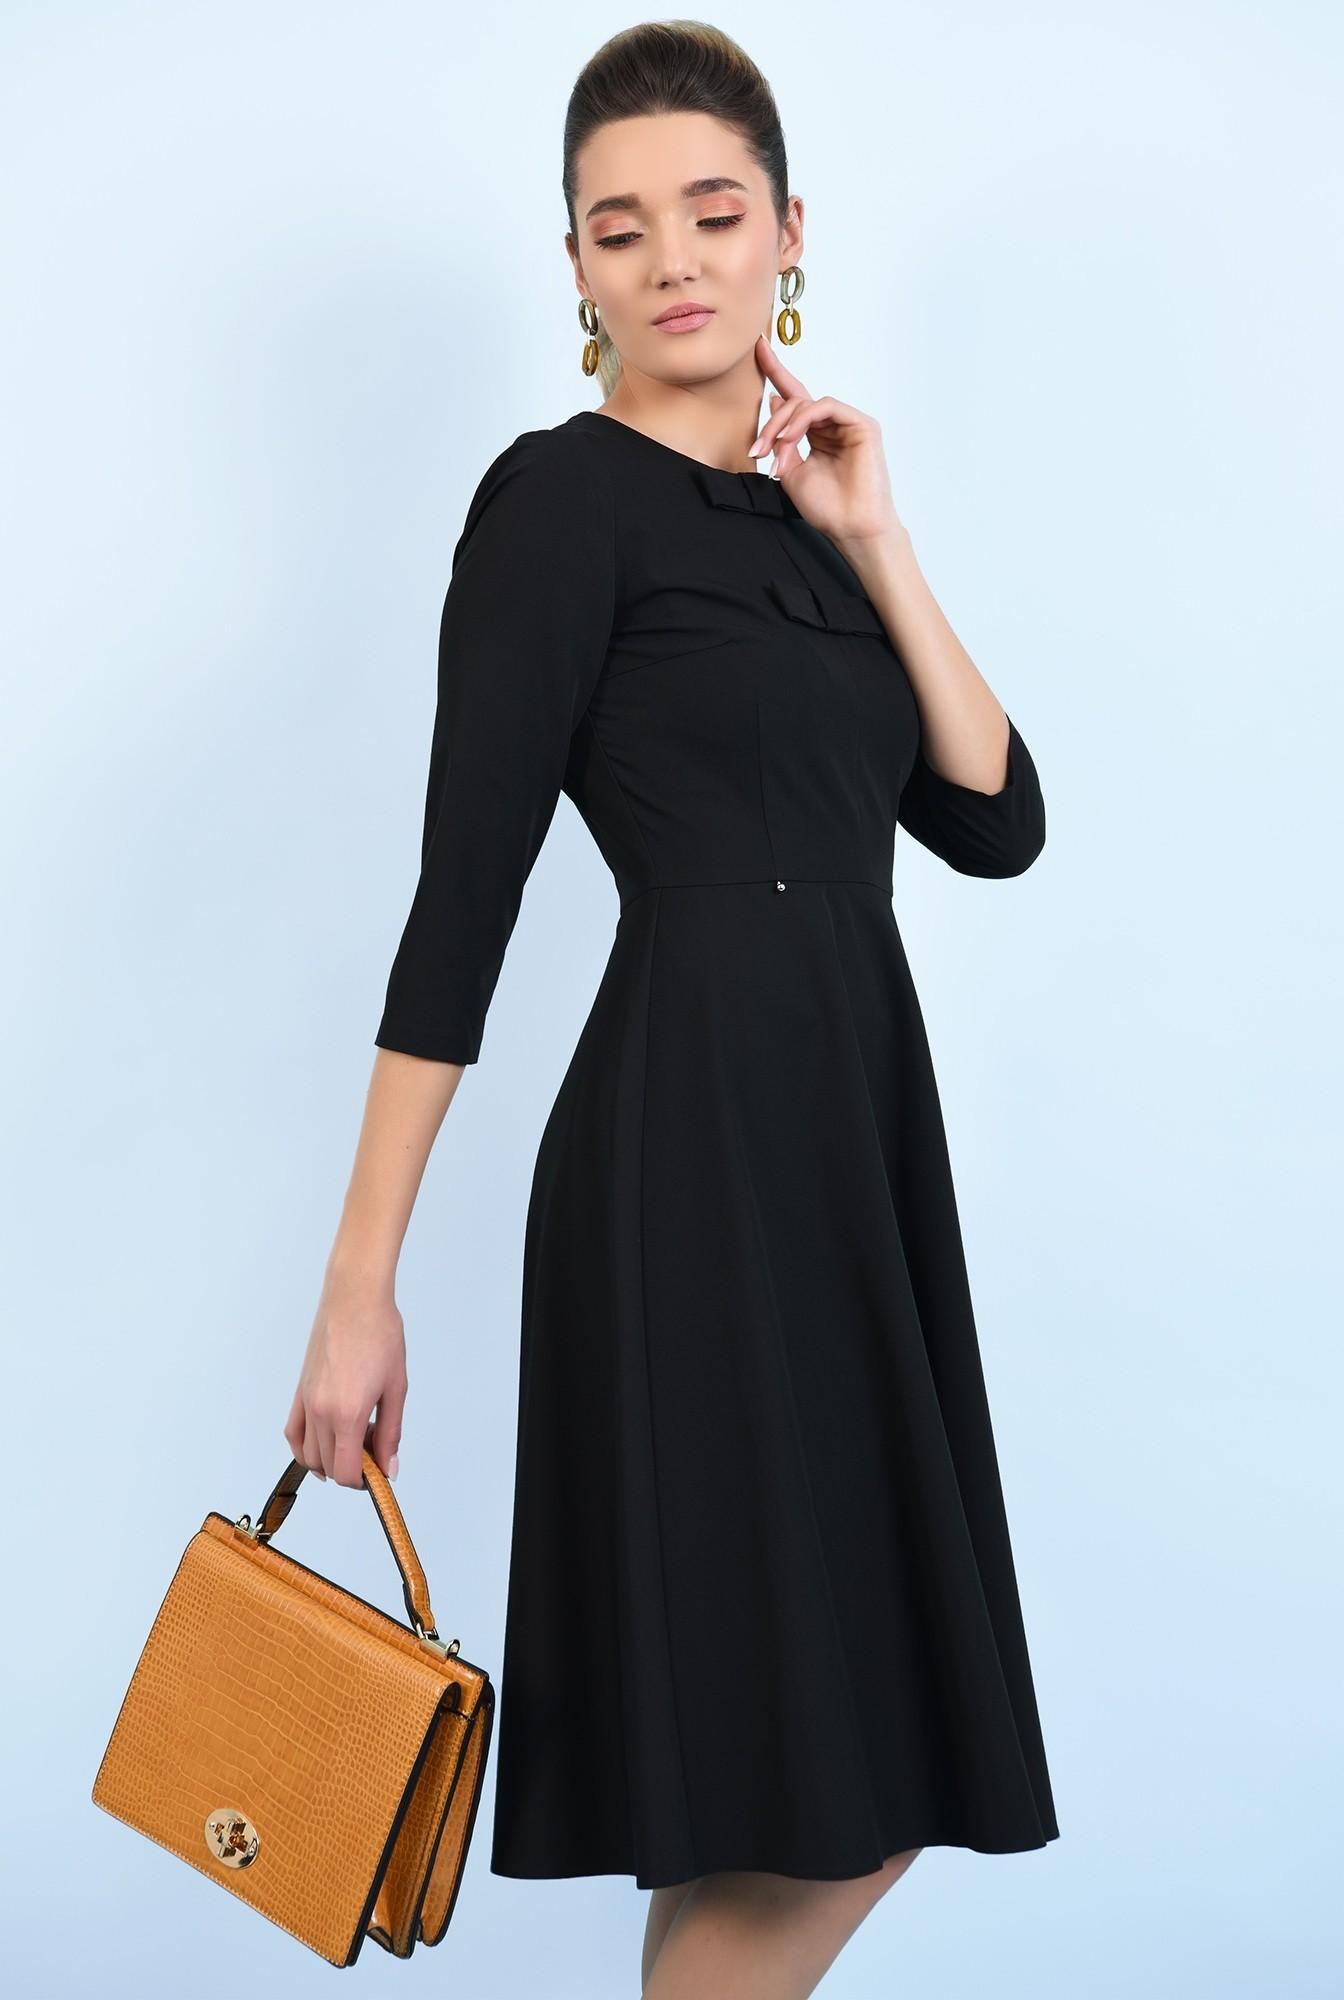 0 - 360 - rochie neagra, evazata, cu funde, rochie office, midi